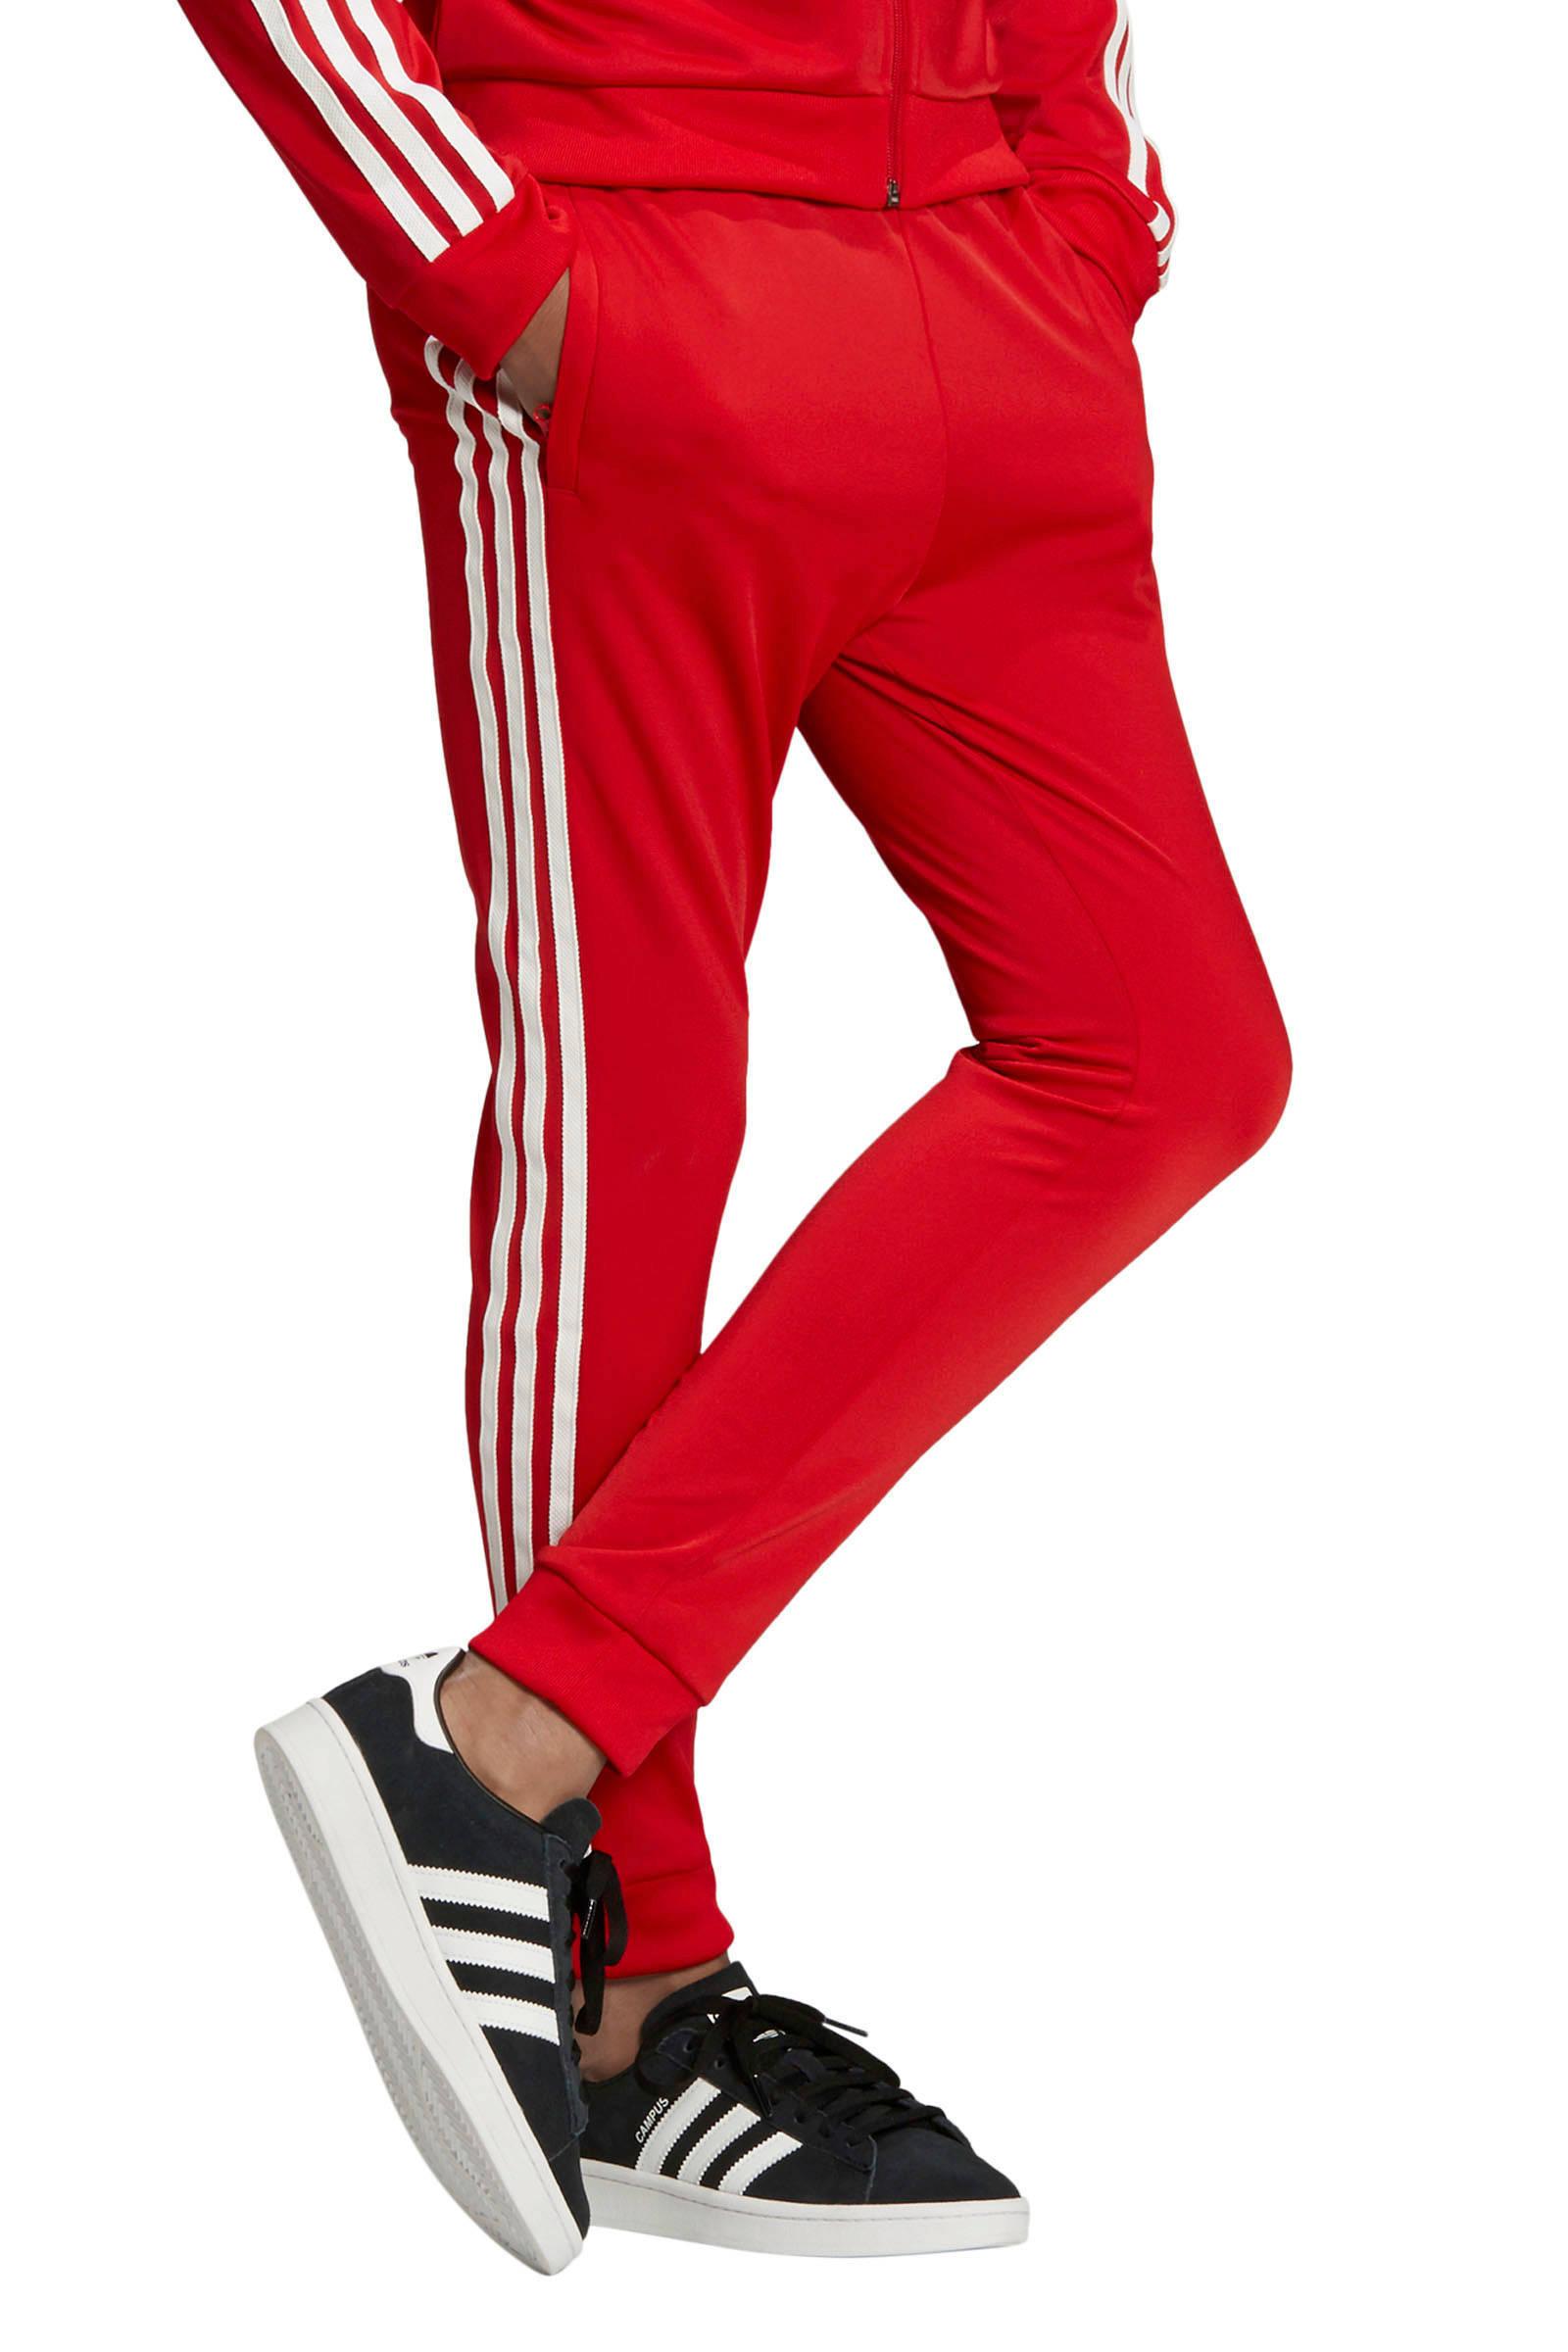 adidas Originals Adicolor trainingsbroek rood | wehkamp